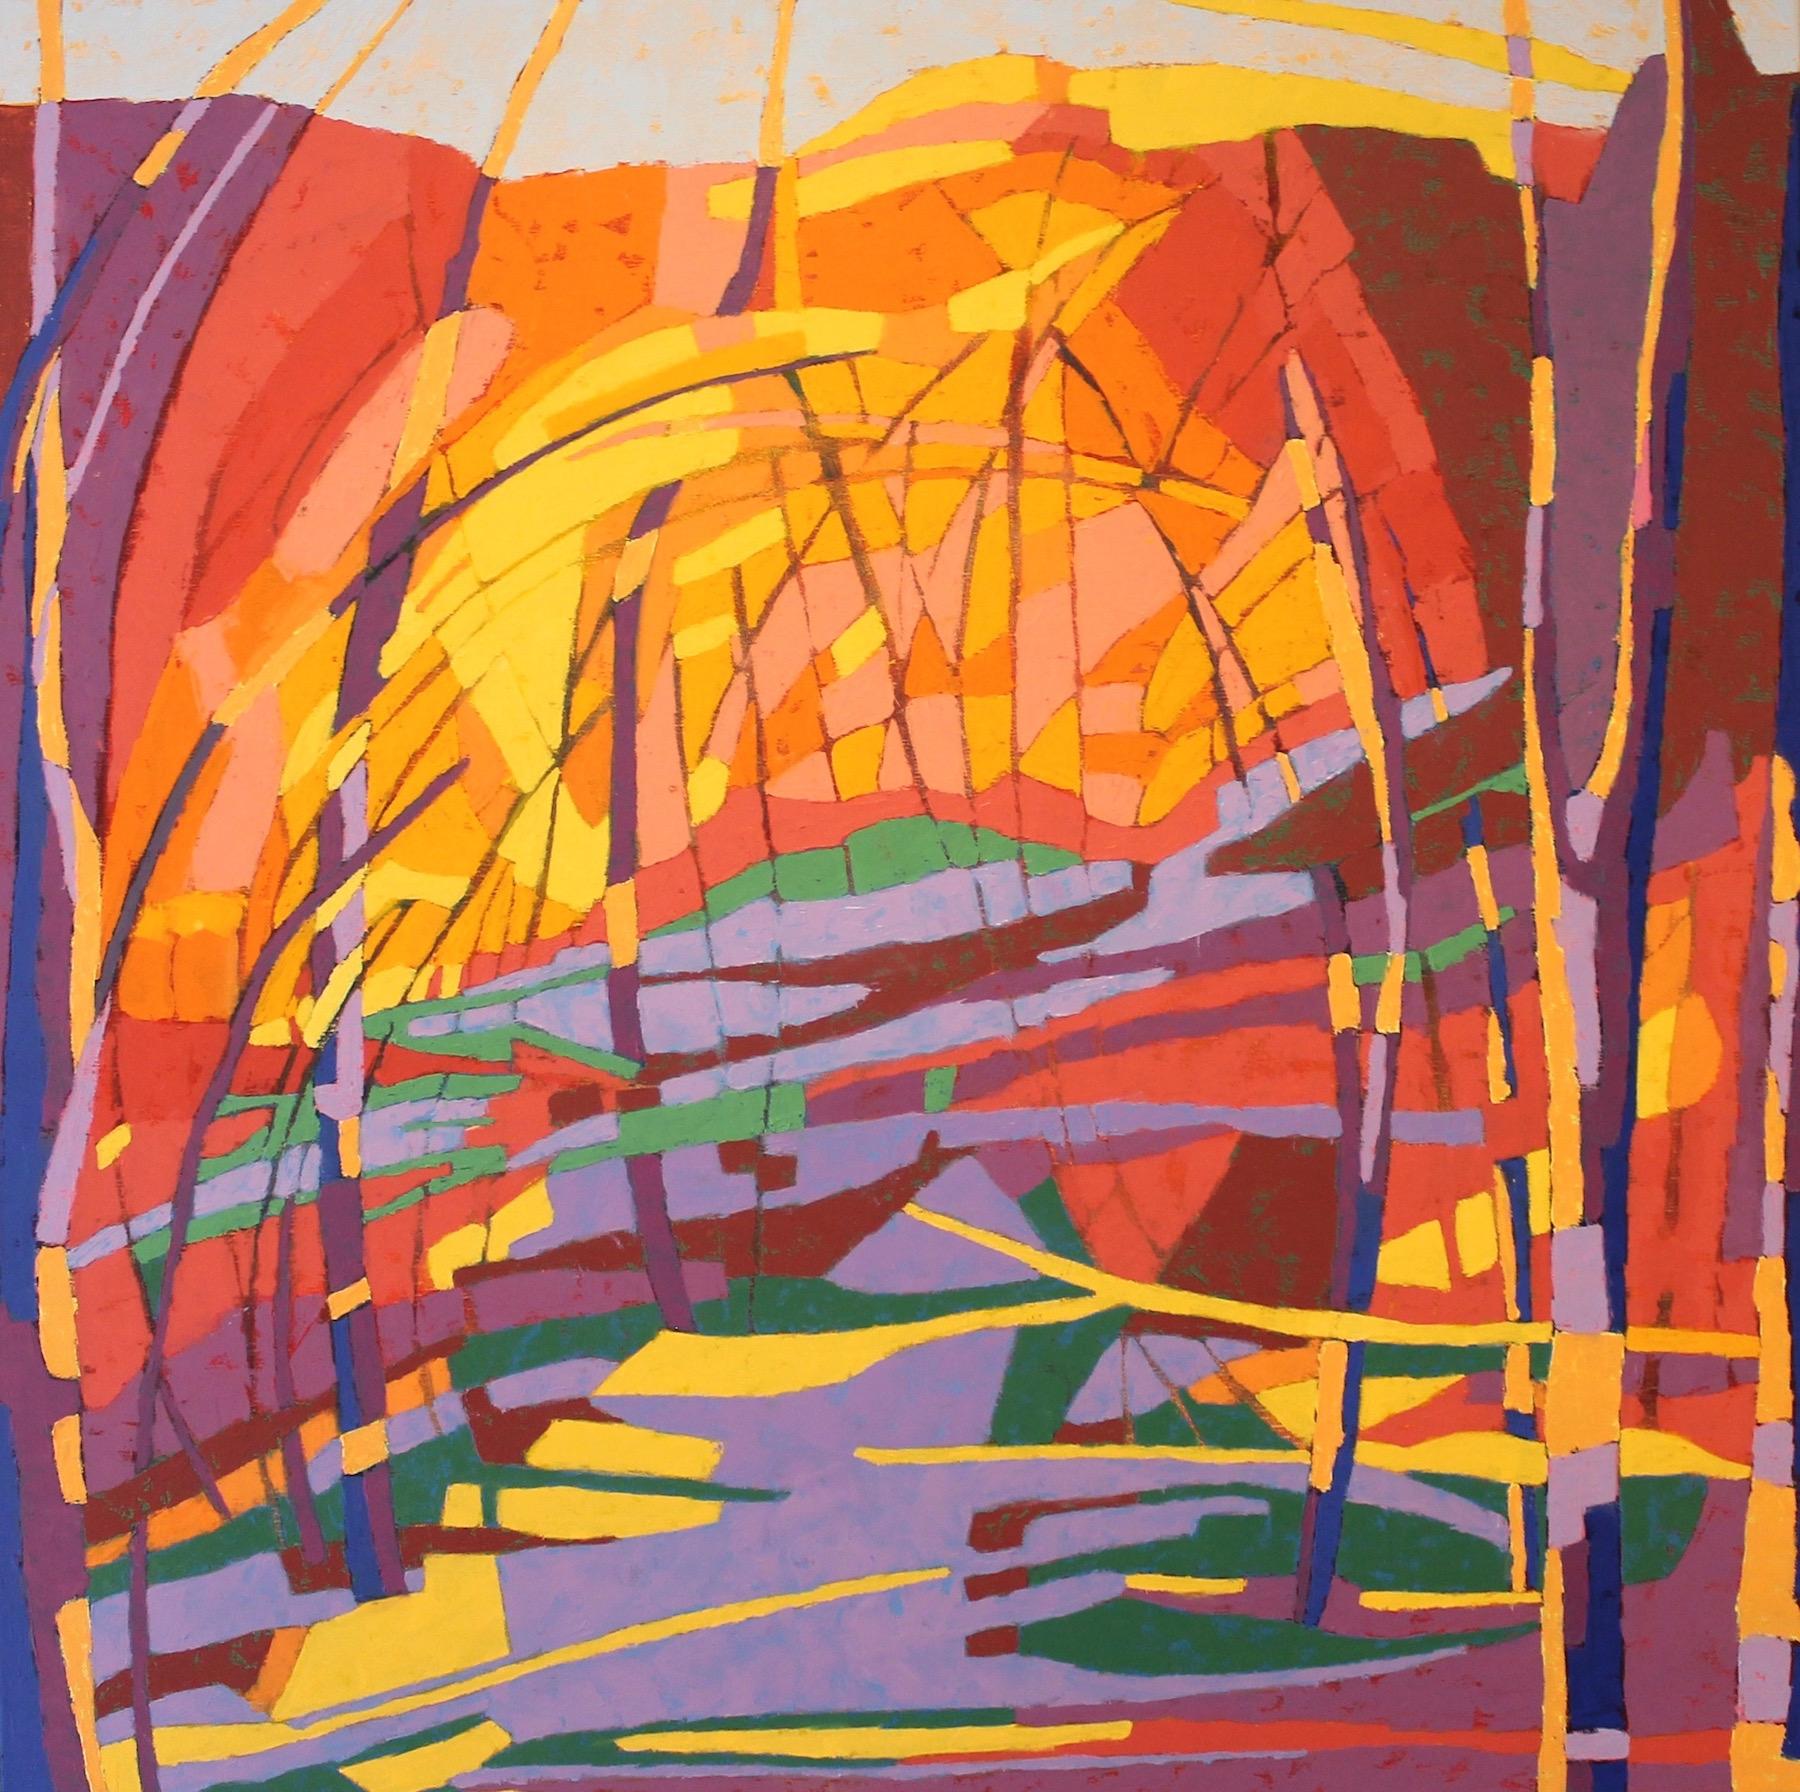 Marcia Wise,  Inner Sanctum ,Oil on canvas, 36x36